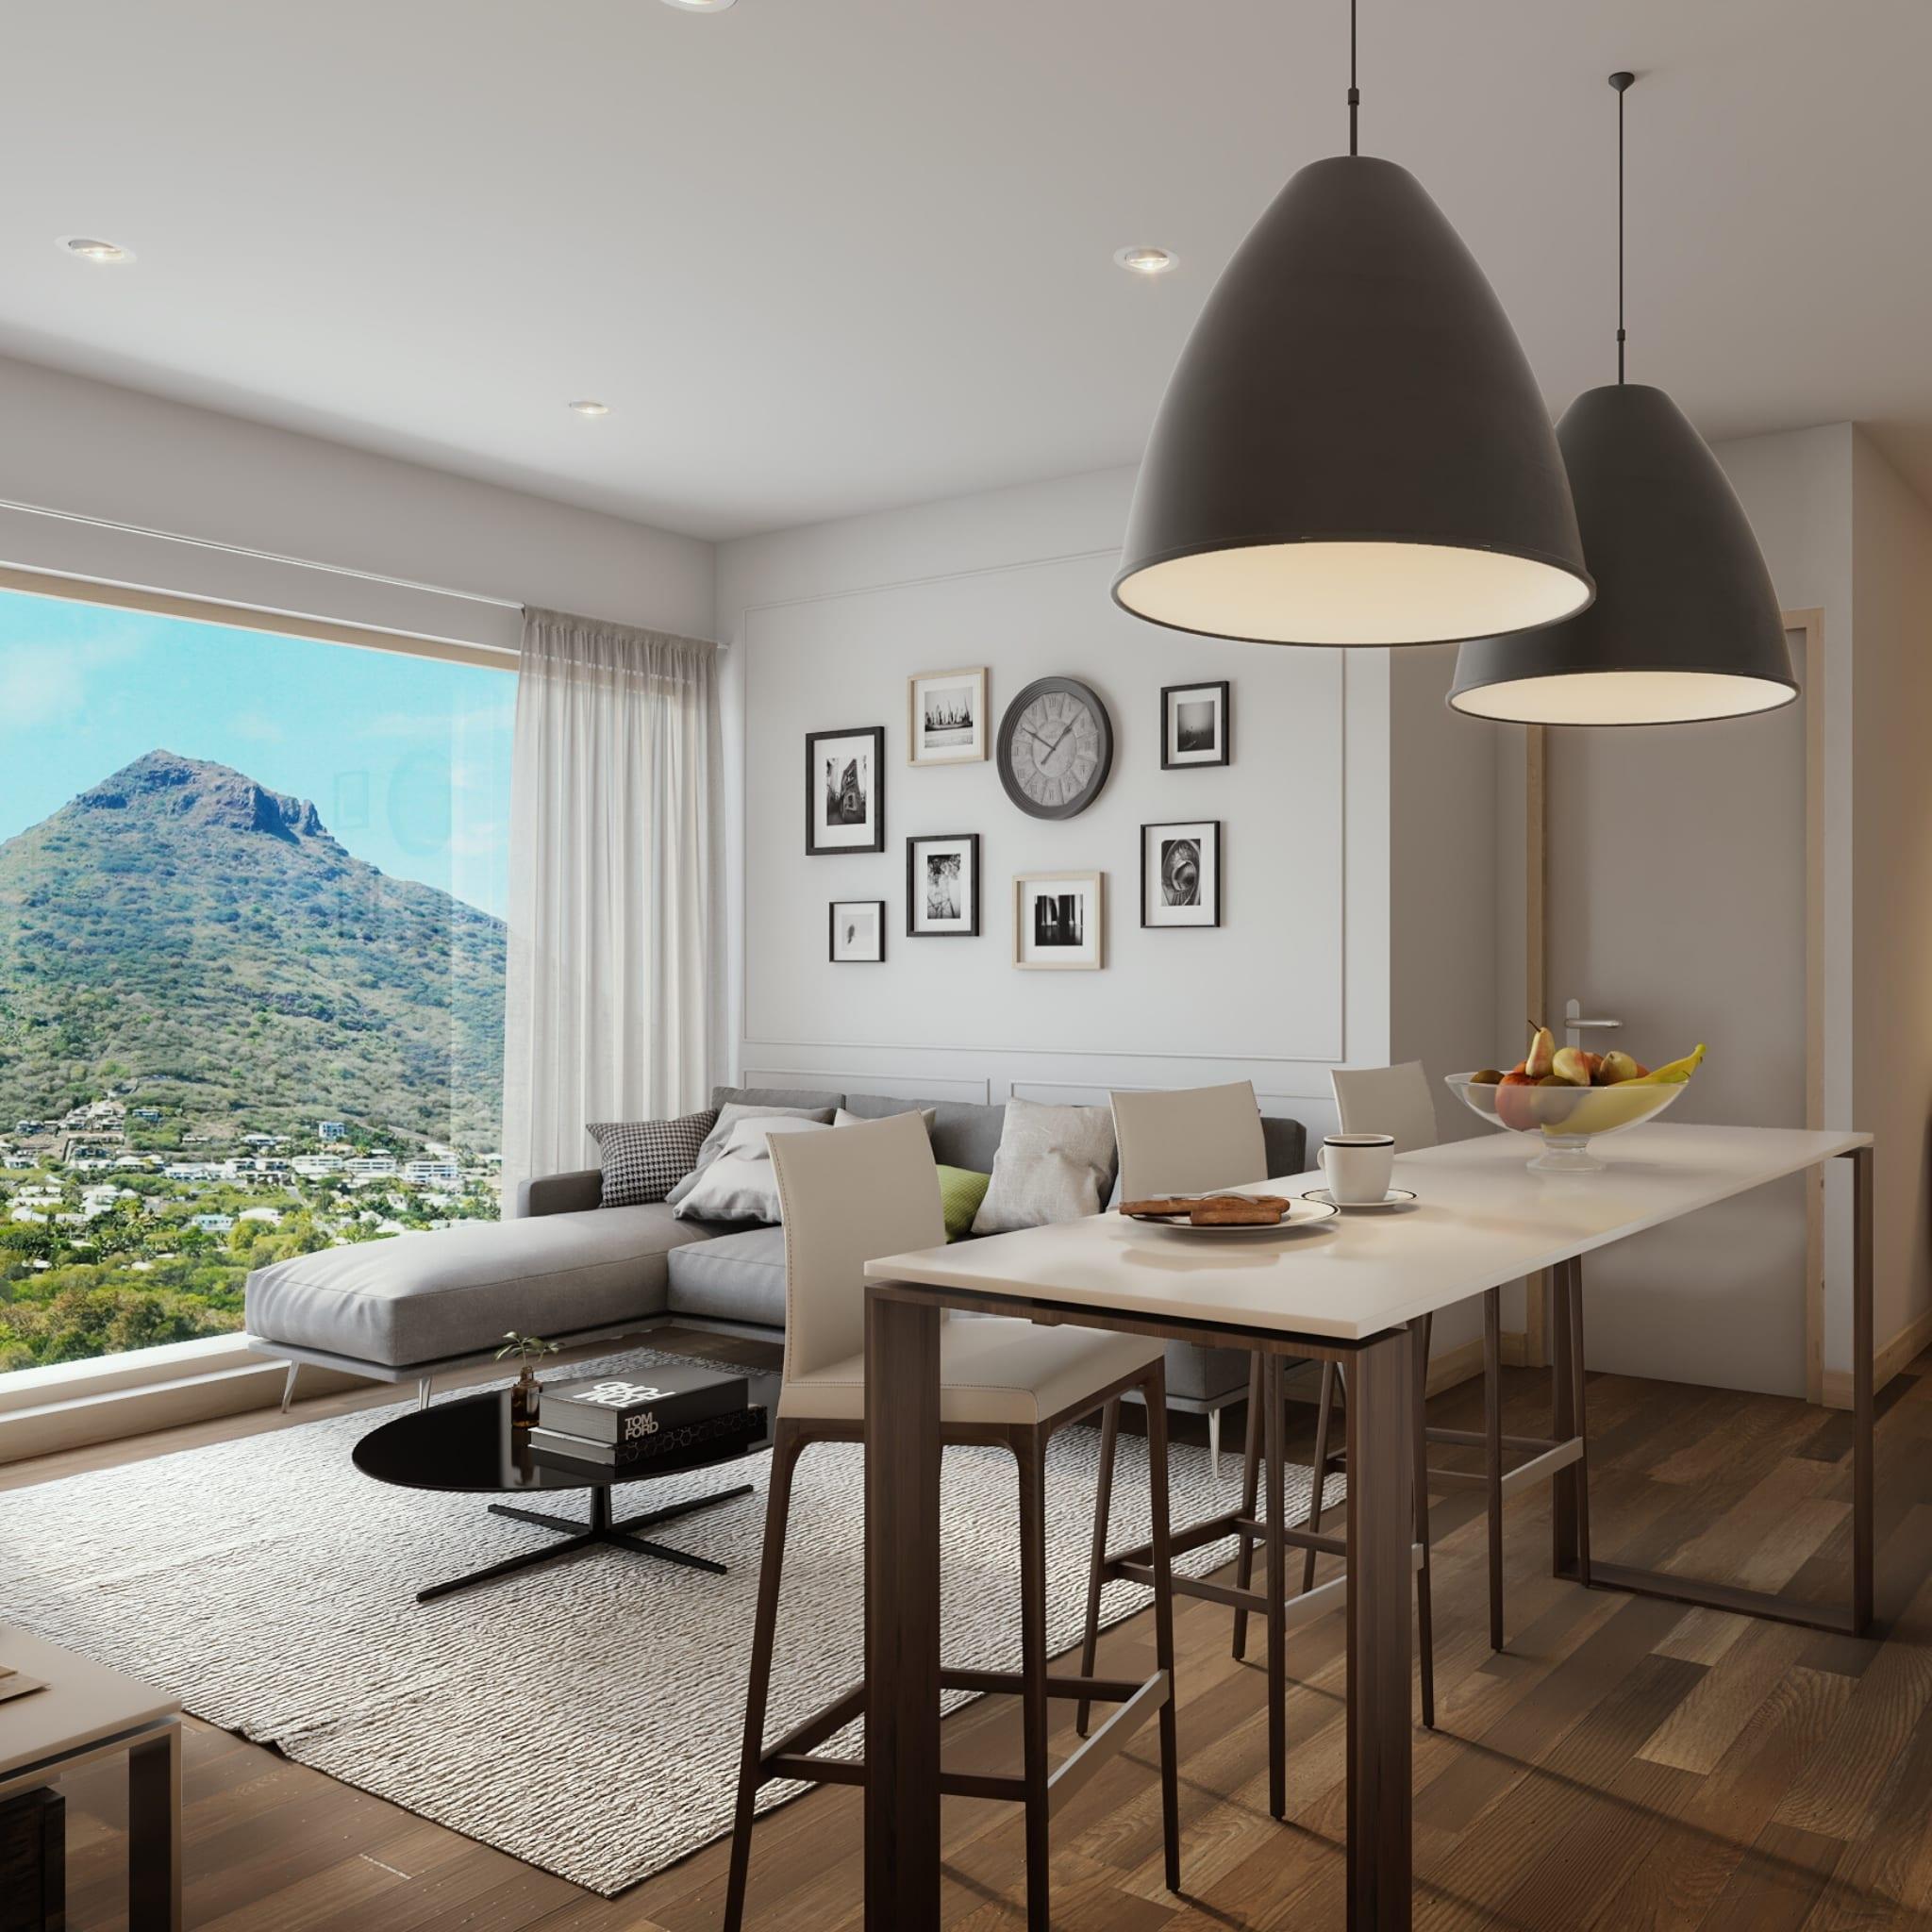 Investissement locatif Appartement de 90m2 logement neuf proche plage